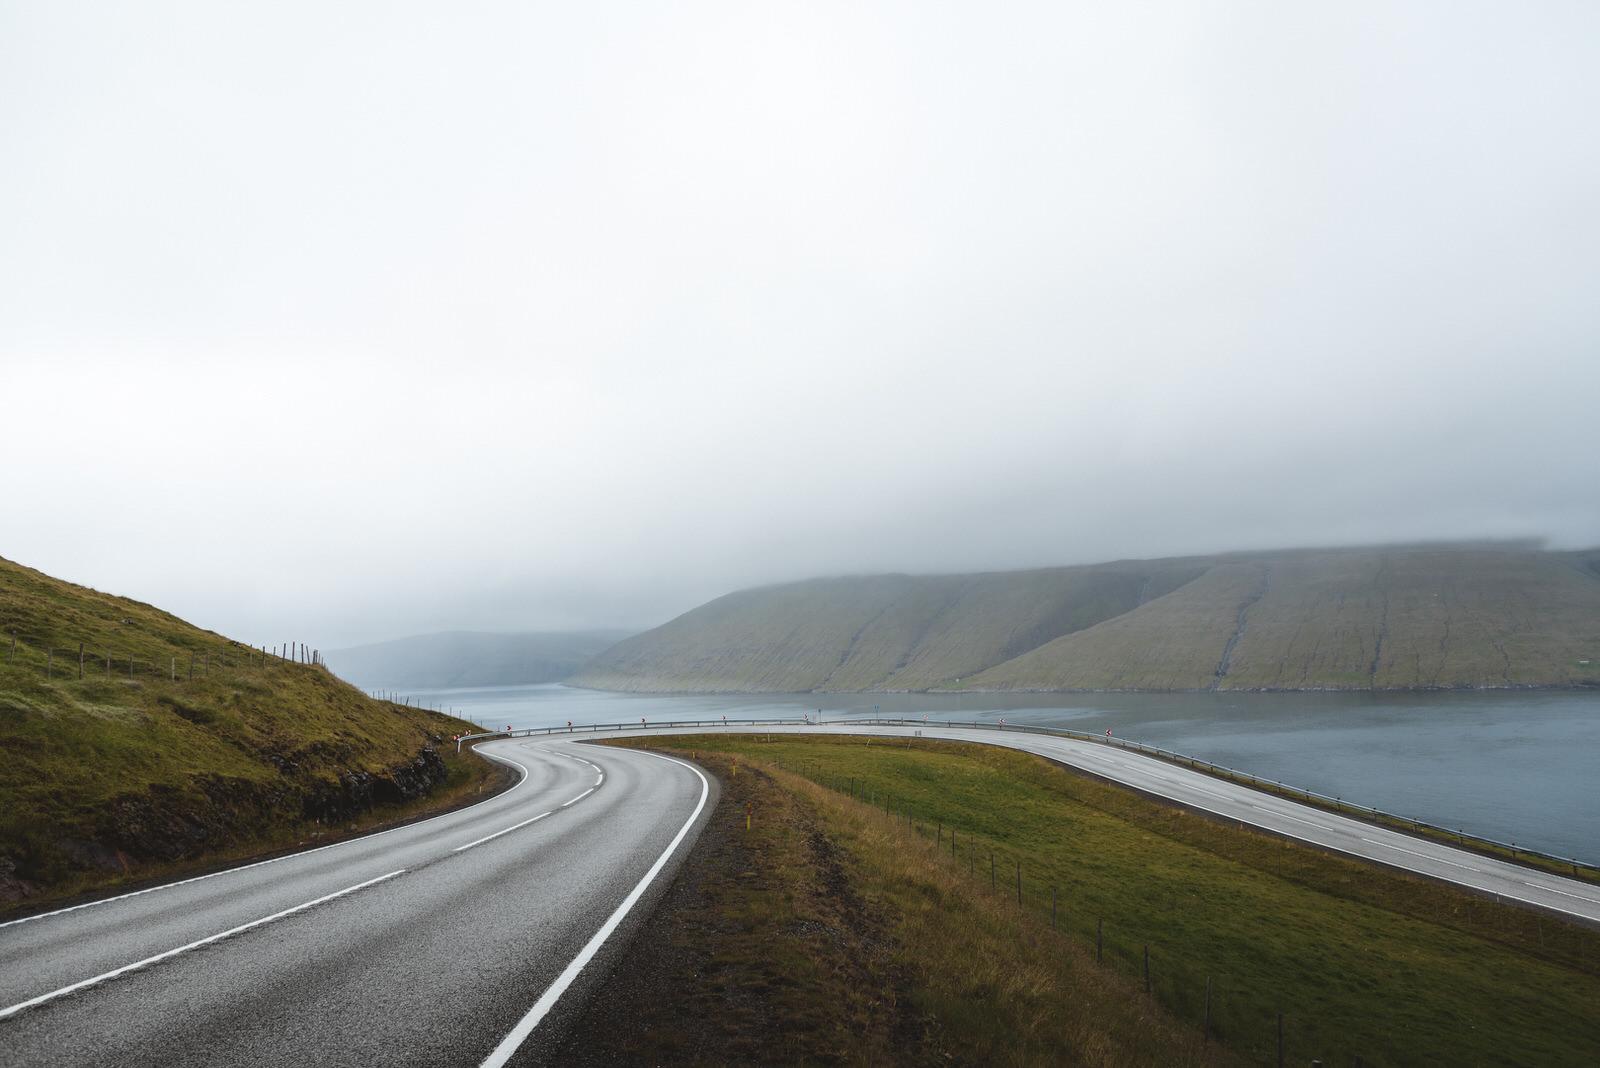 faroe islands road trip 2016 day 1 torshavn sorvagsvatn